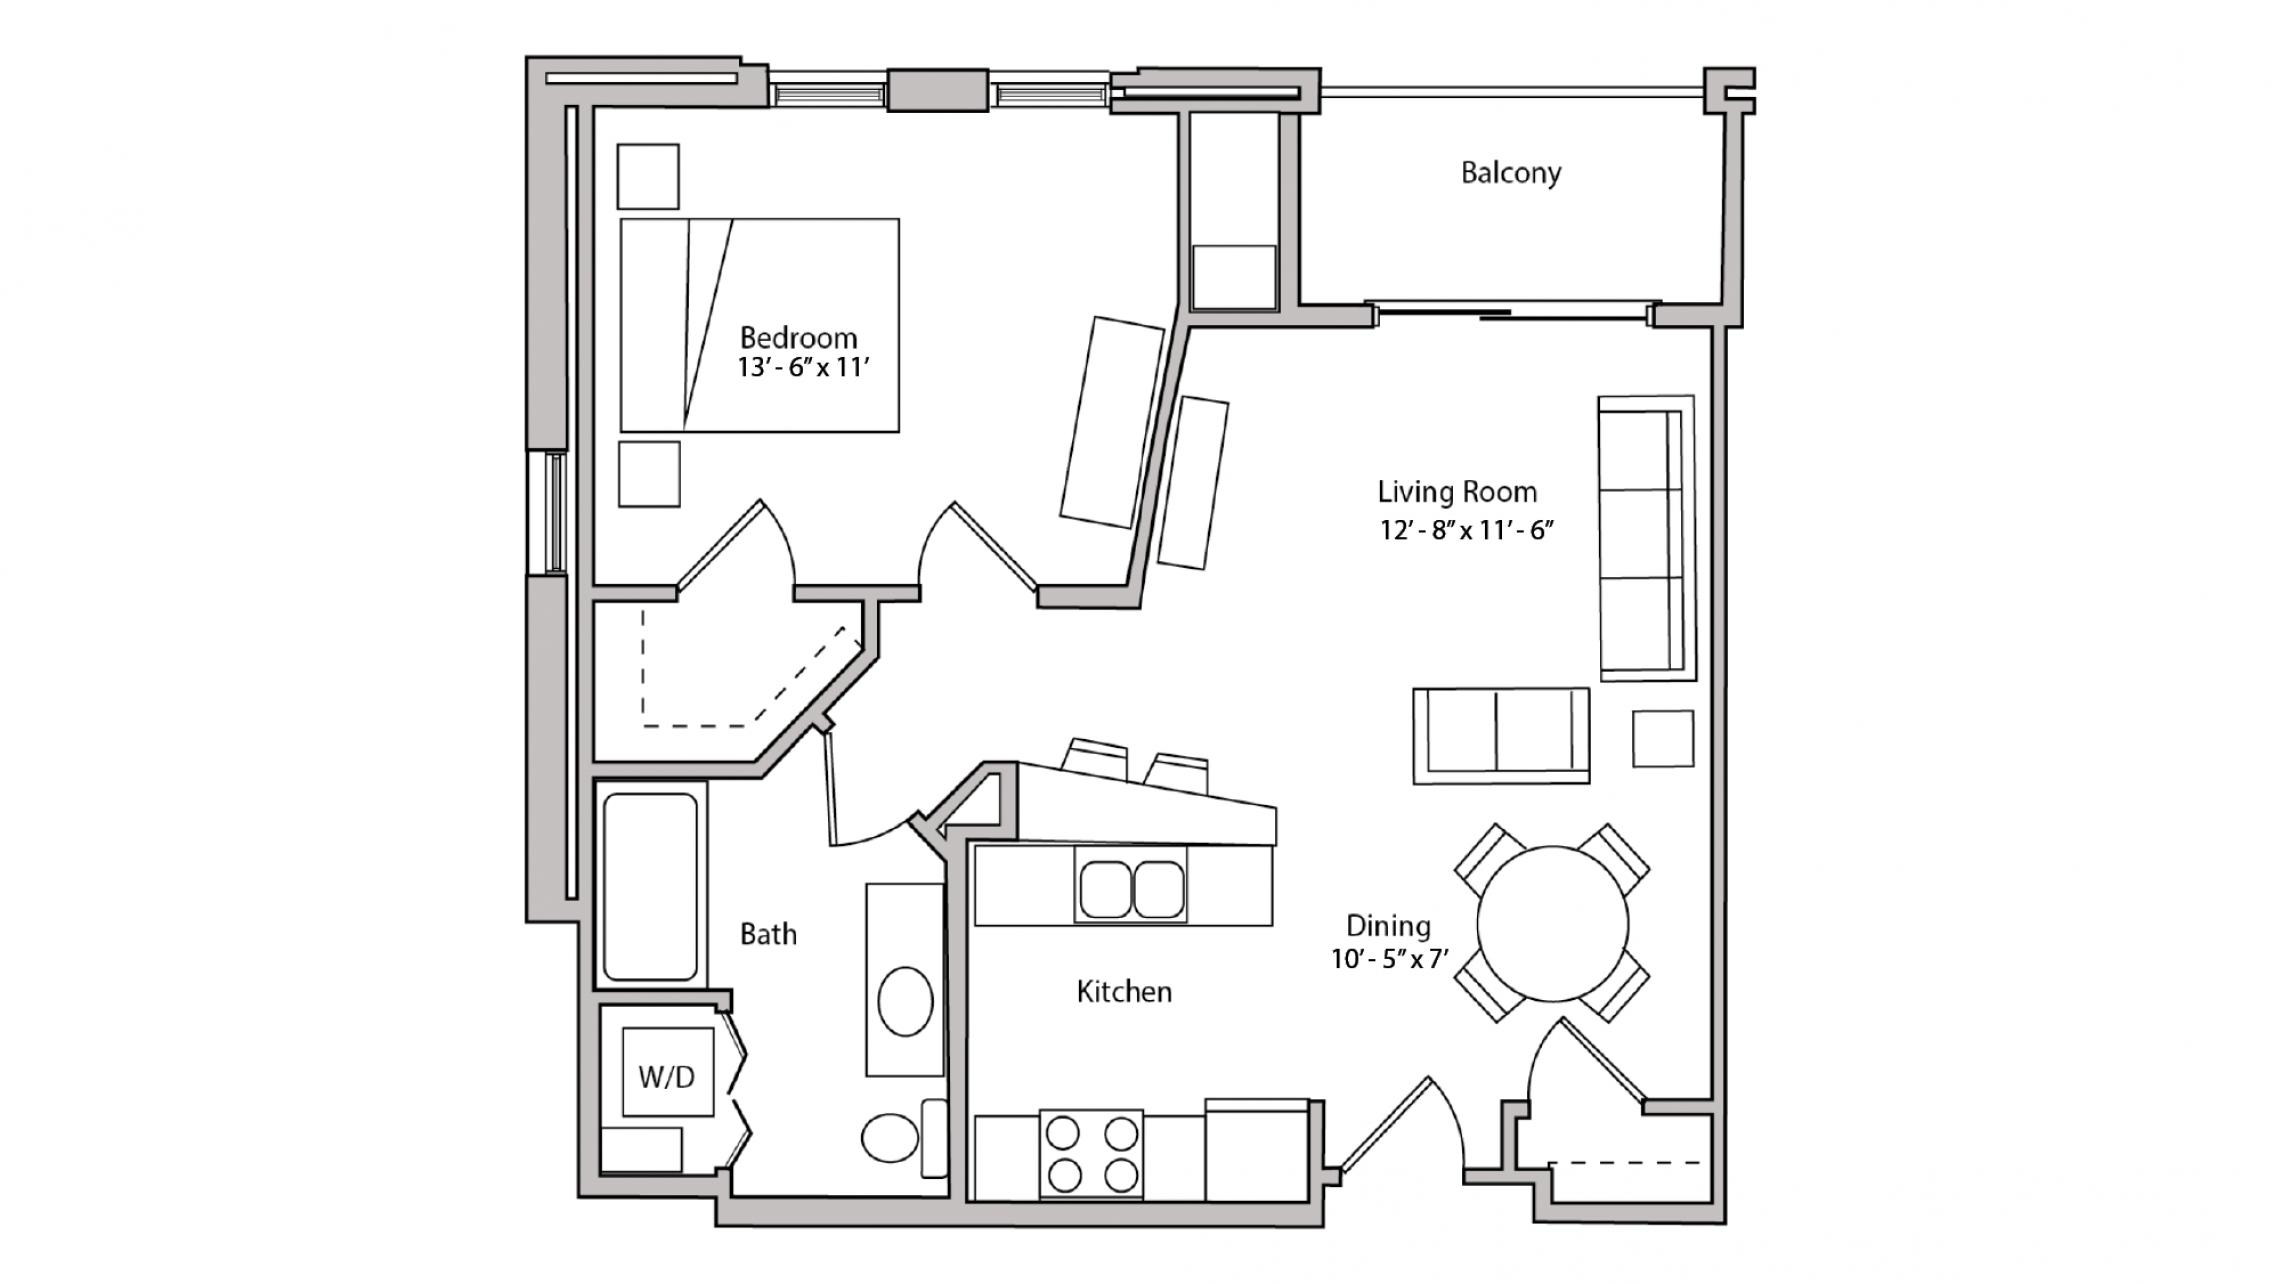 ULI The Depot 2-303 - One Bedroom, One Bathroom